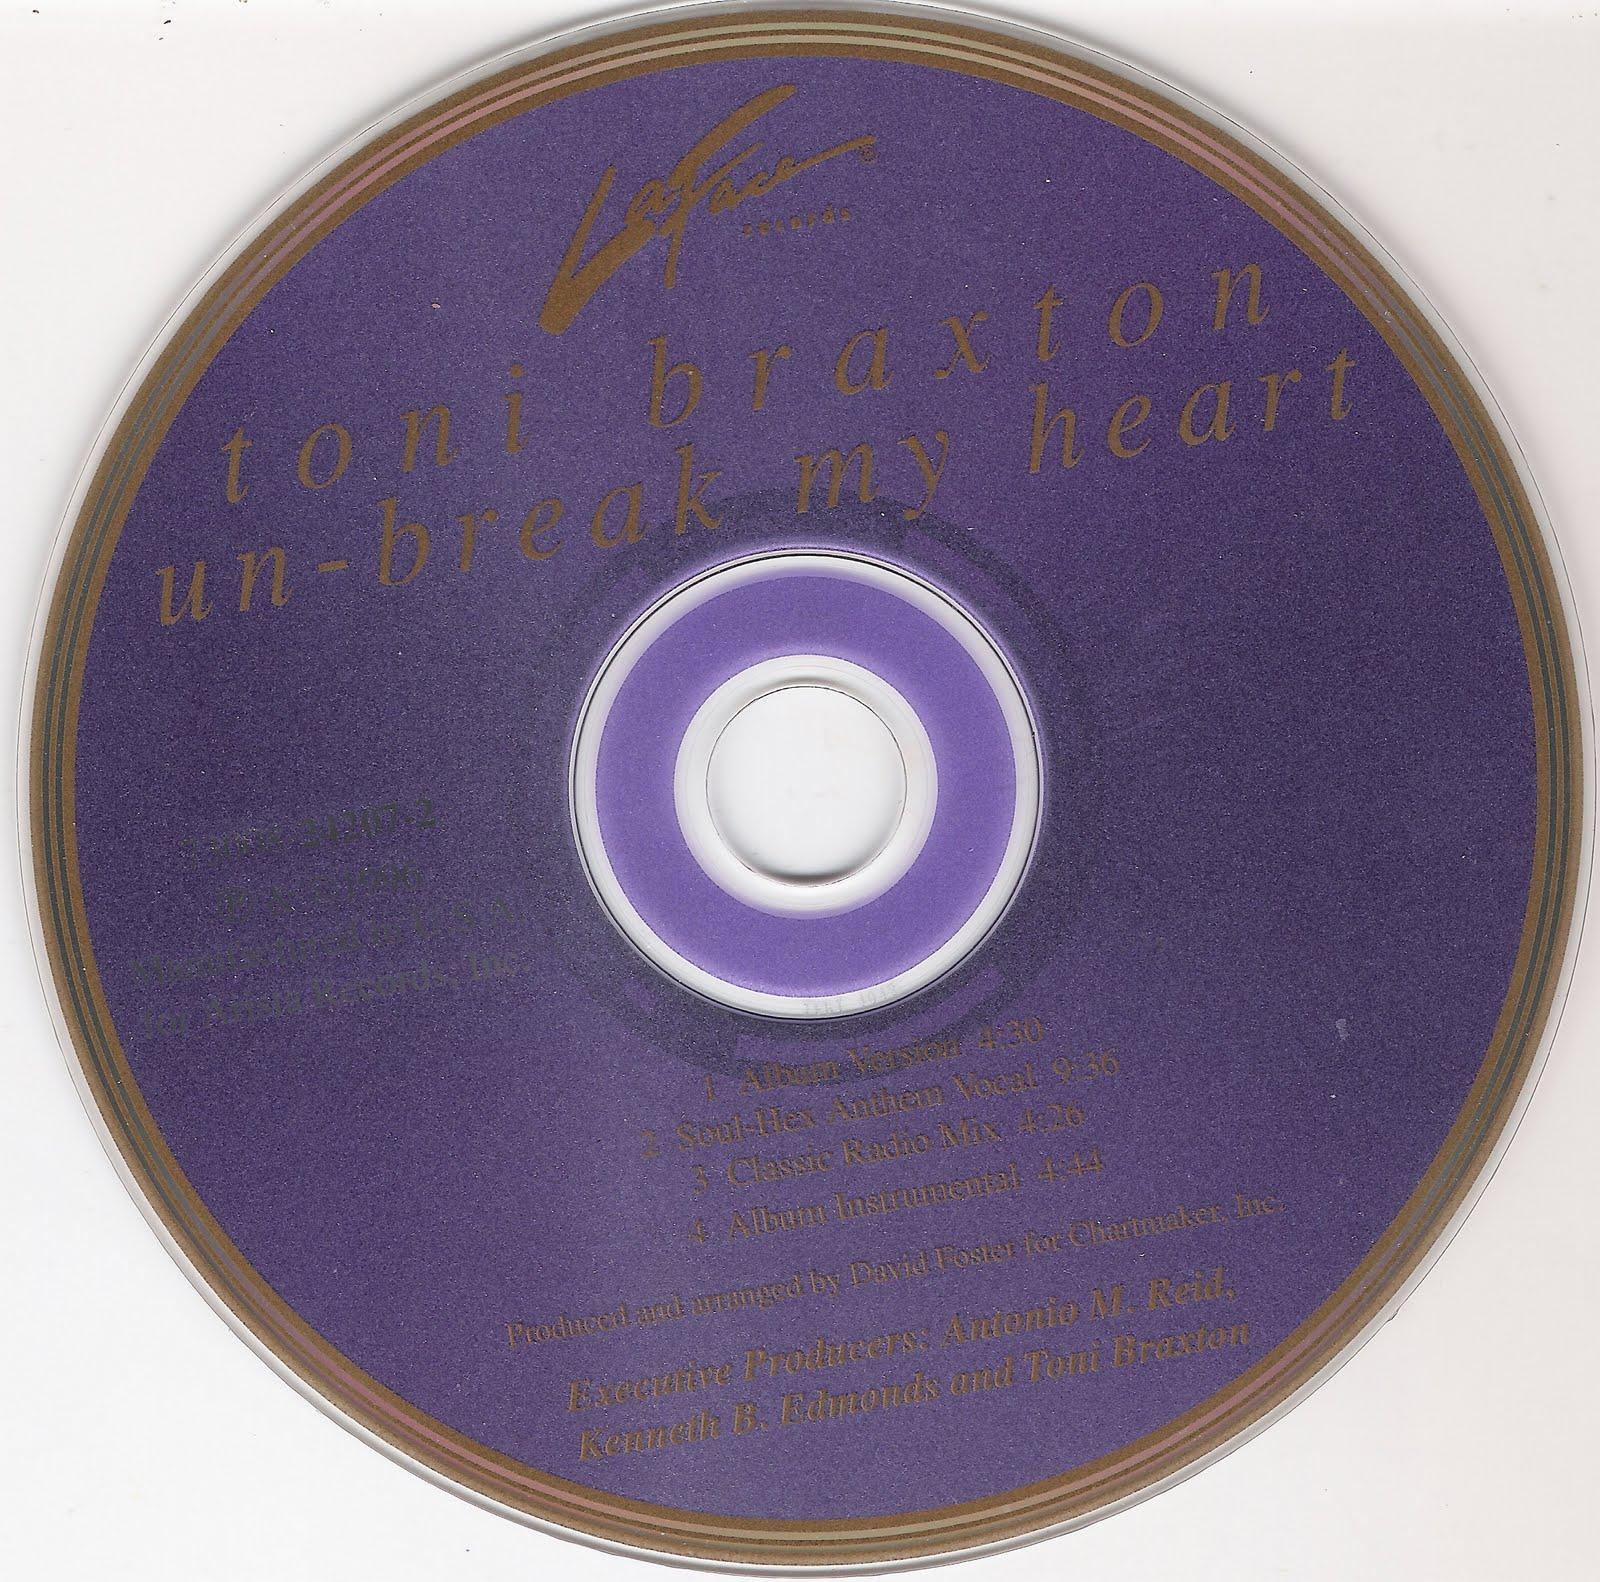 http://1.bp.blogspot.com/-OS6OX9LIV54/TZpFP0rhVoI/AAAAAAAAIx8/d1Ddn8aeLqg/s1600/00-toni_braxton-un-break_my_heart-%2528cdm%2529-1996-cd.jpg